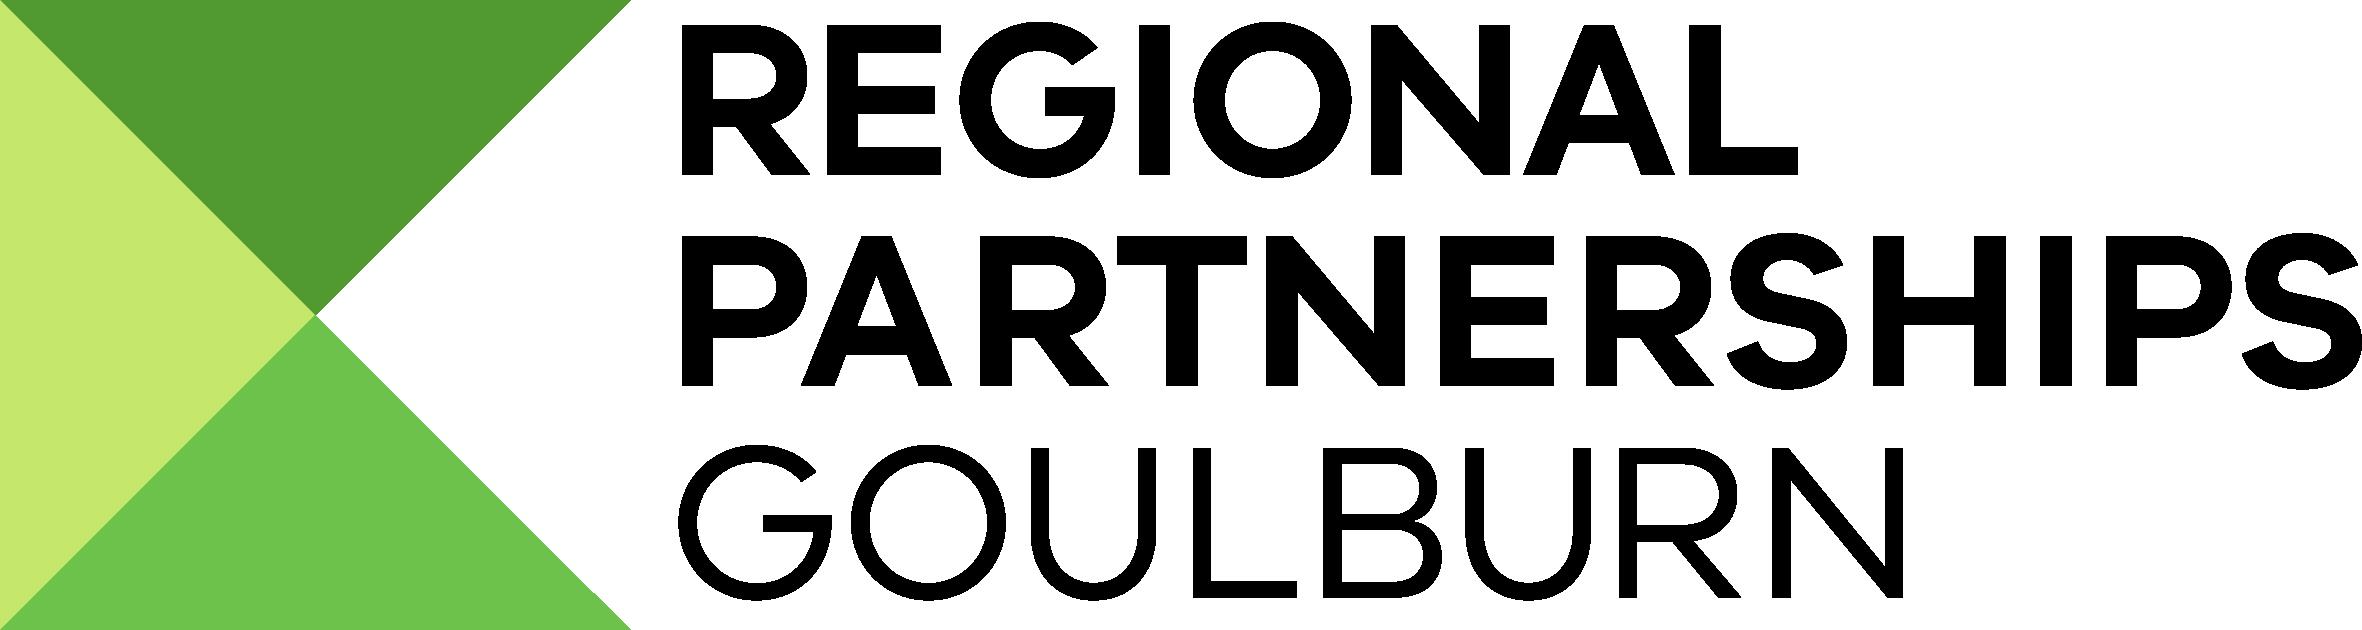 Goulburn Regional Partnerships Logo